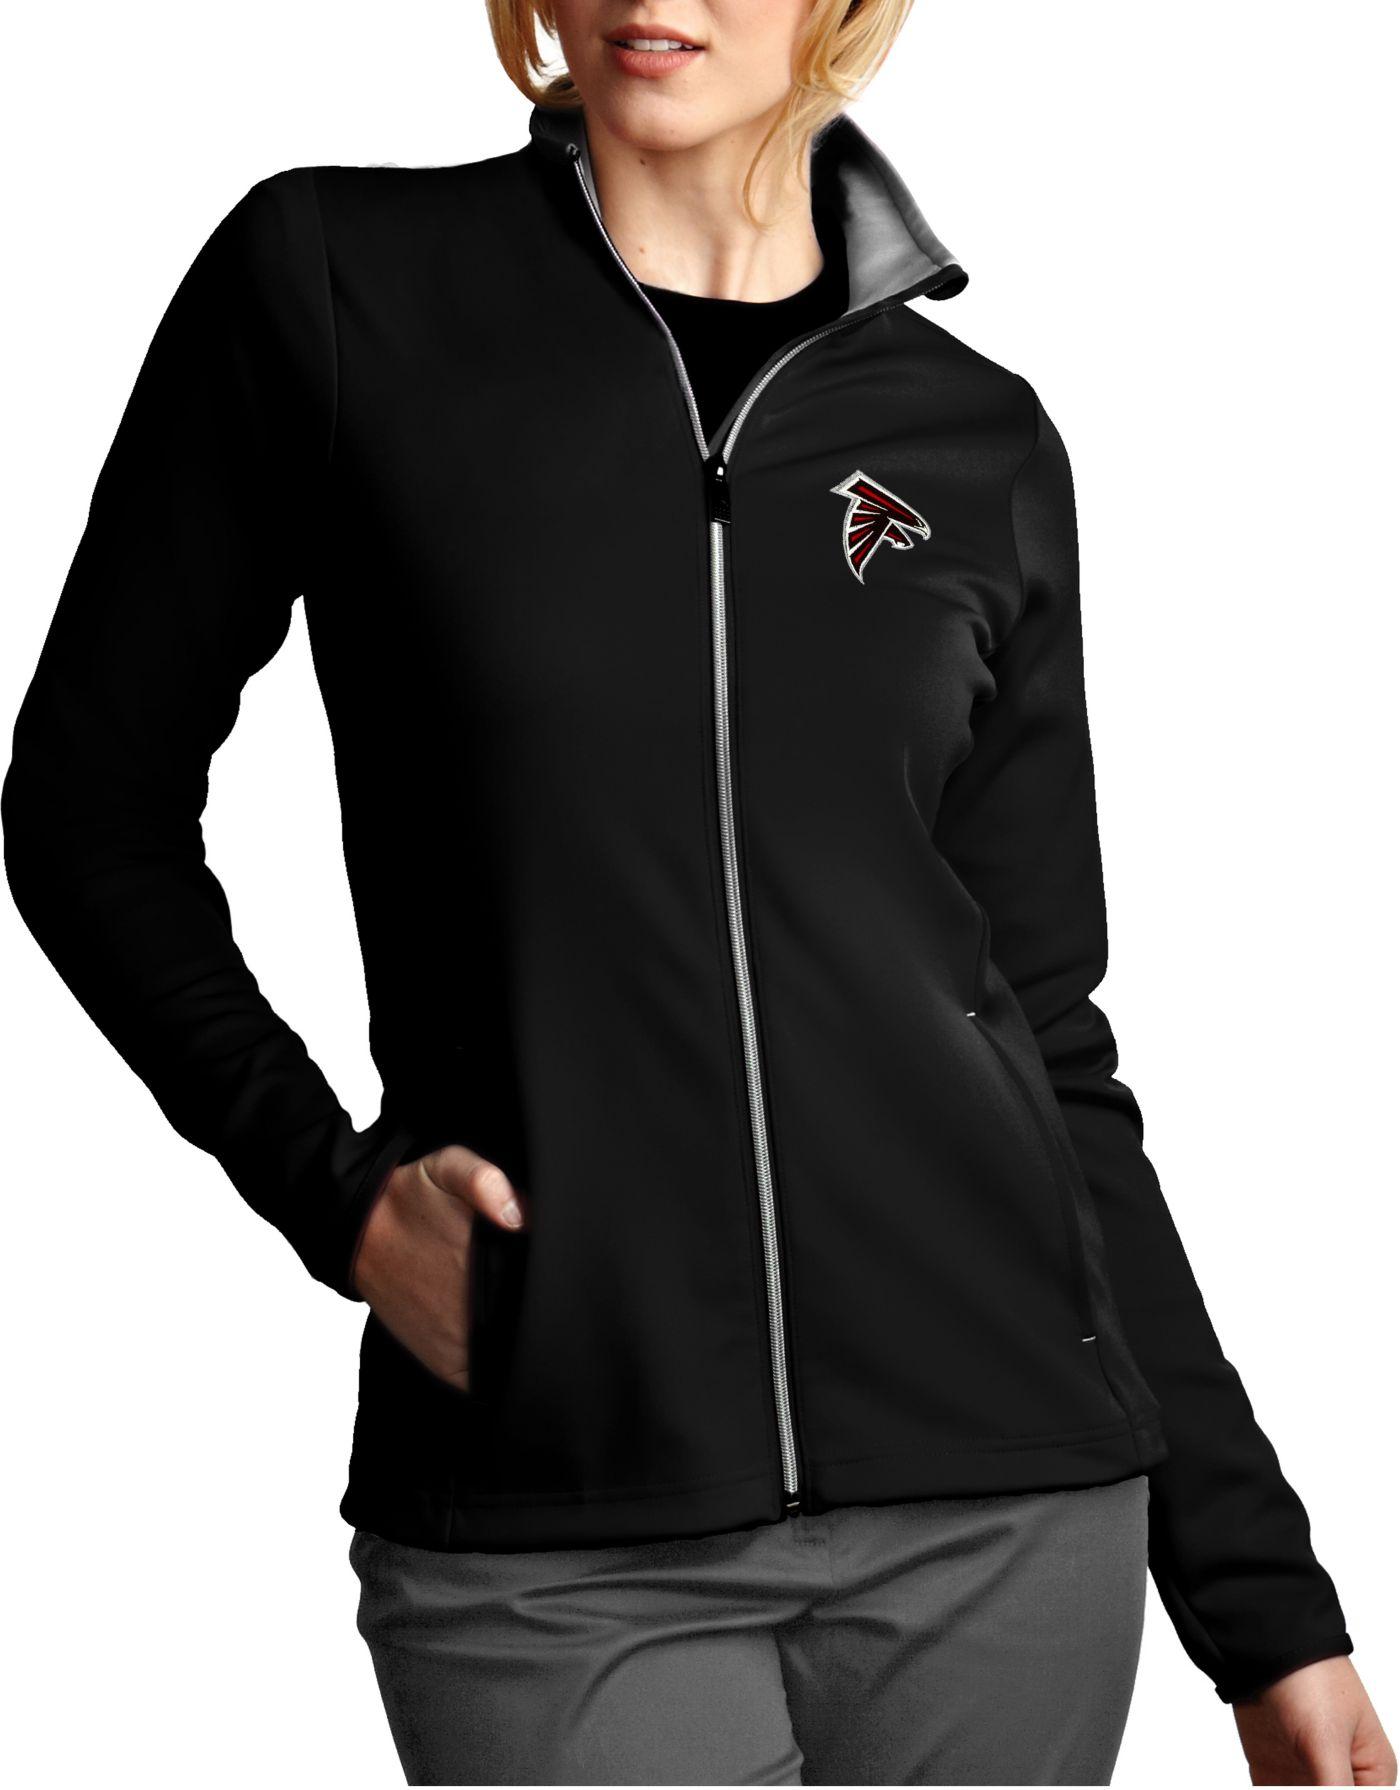 Antigua Women's Atlanta Falcons Leader Full-Zip Black Jacket